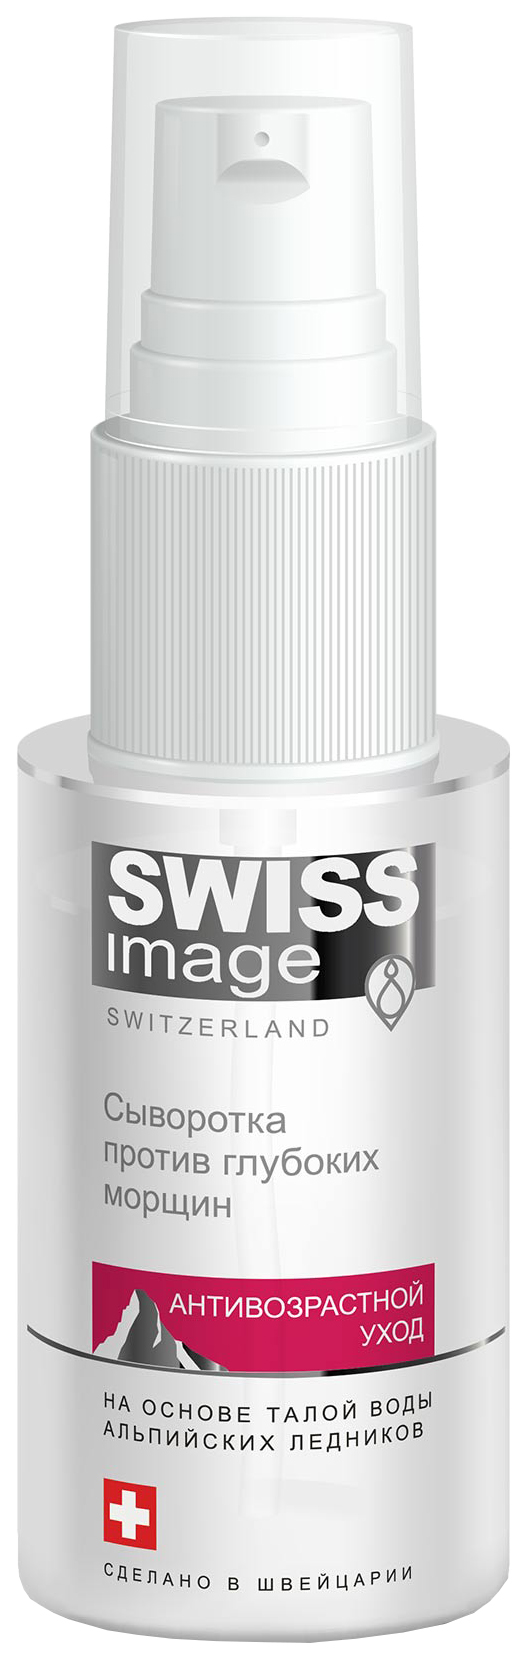 Сыворотка для лица SWISS image АНТИВОЗРАСТНОЙ УХОД Против глубоких морщин 270 мл фото